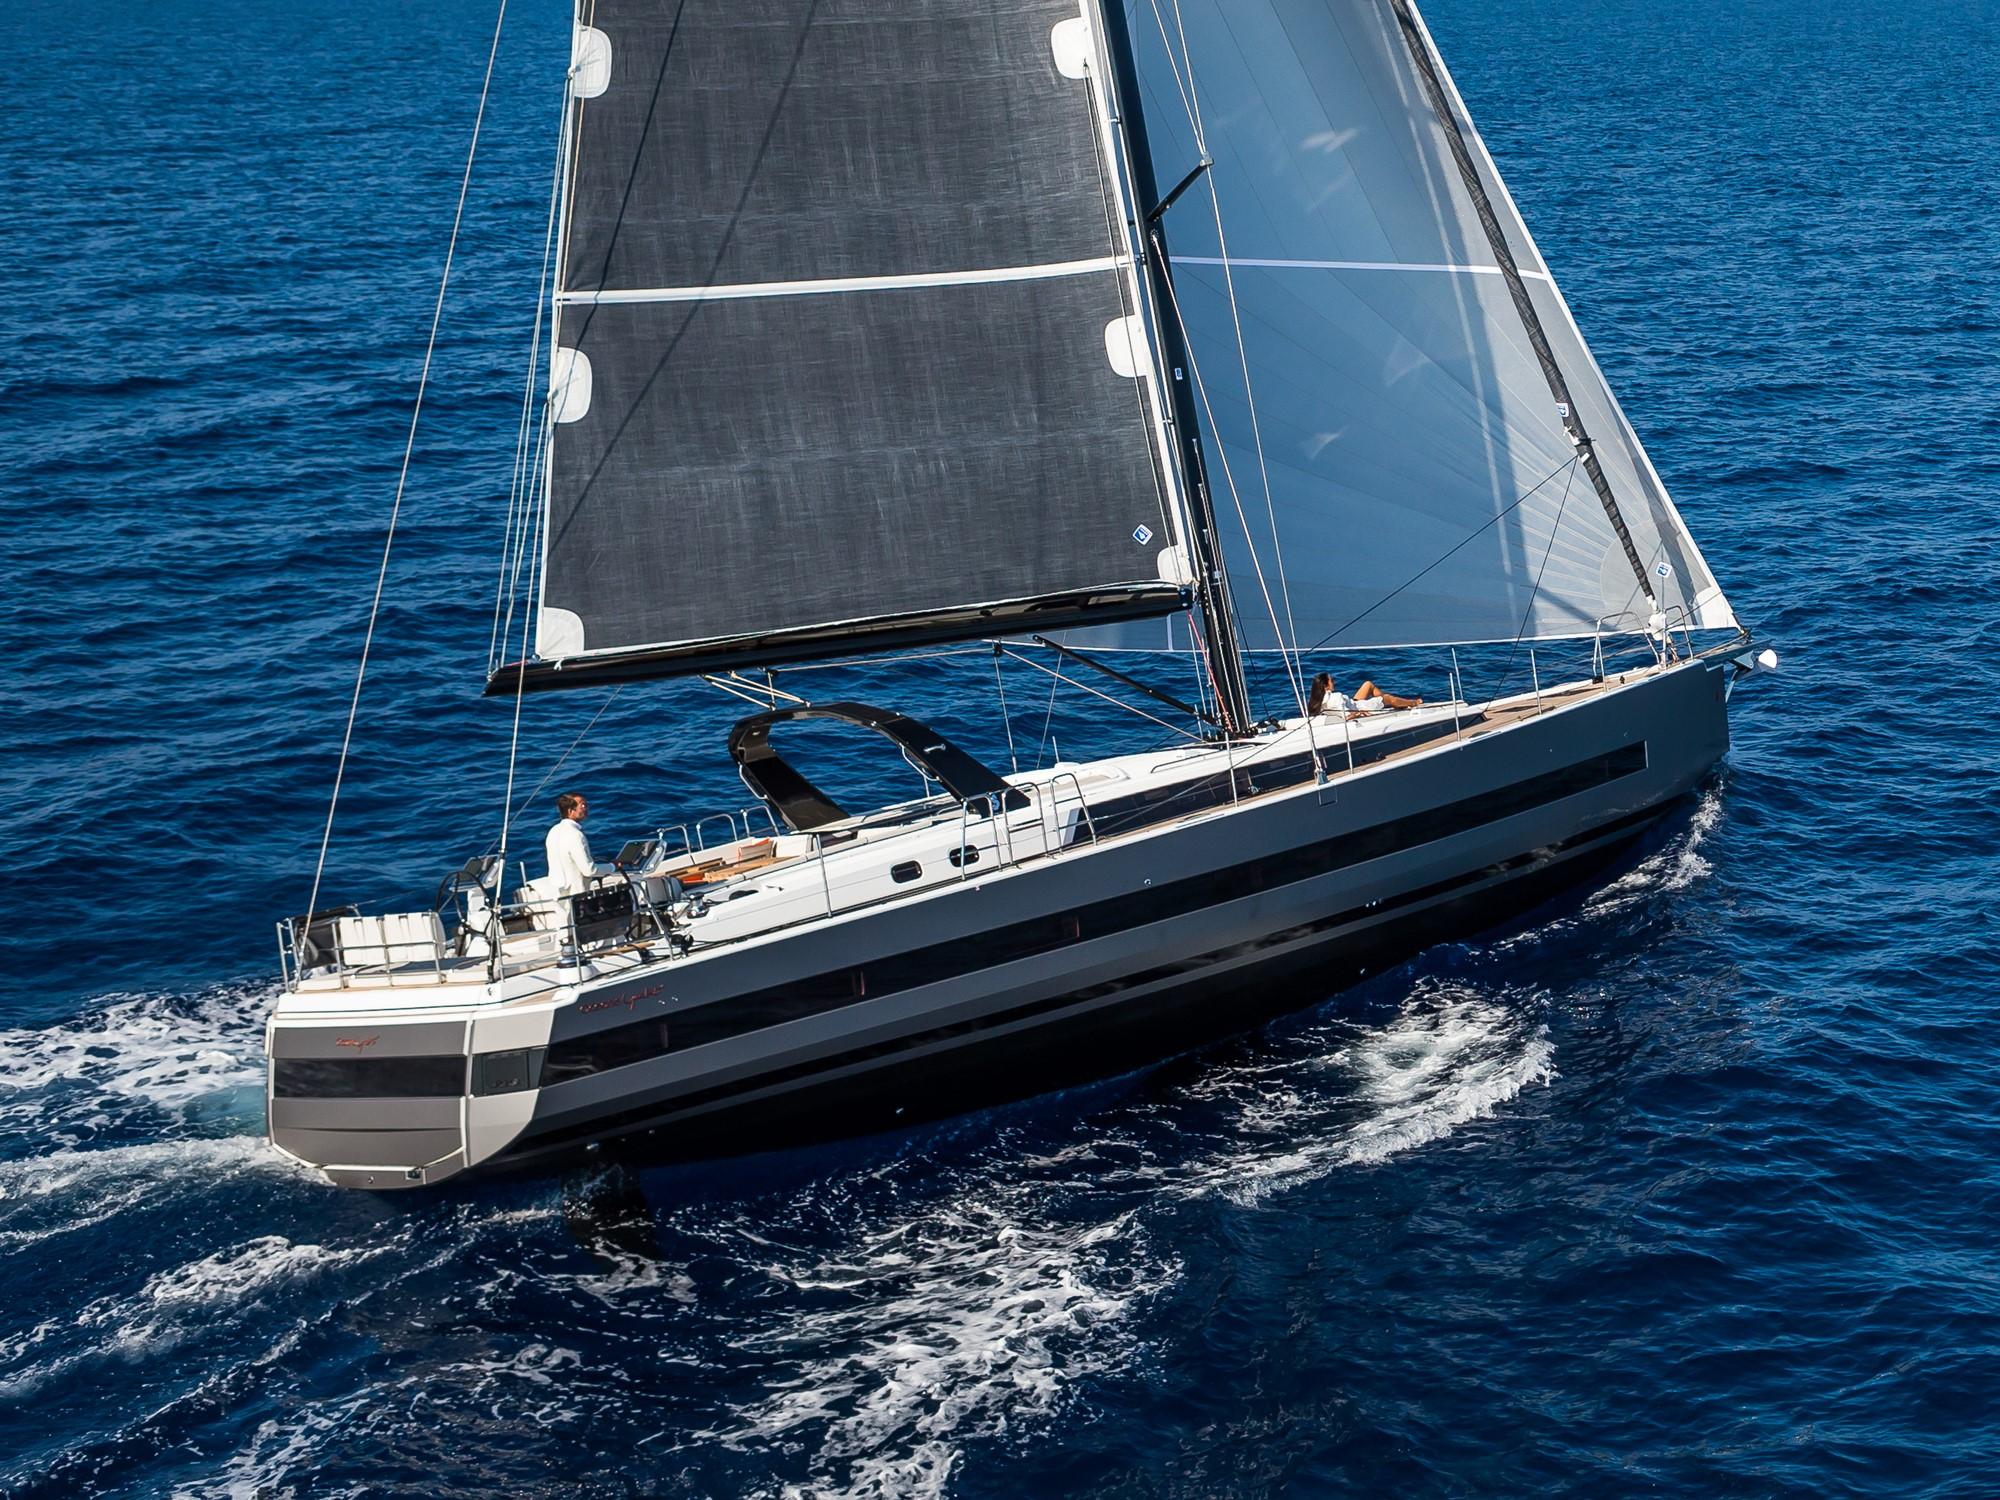 Beneteau Oceanis Yacht 62 Beneteau Oceanis Yacht 62